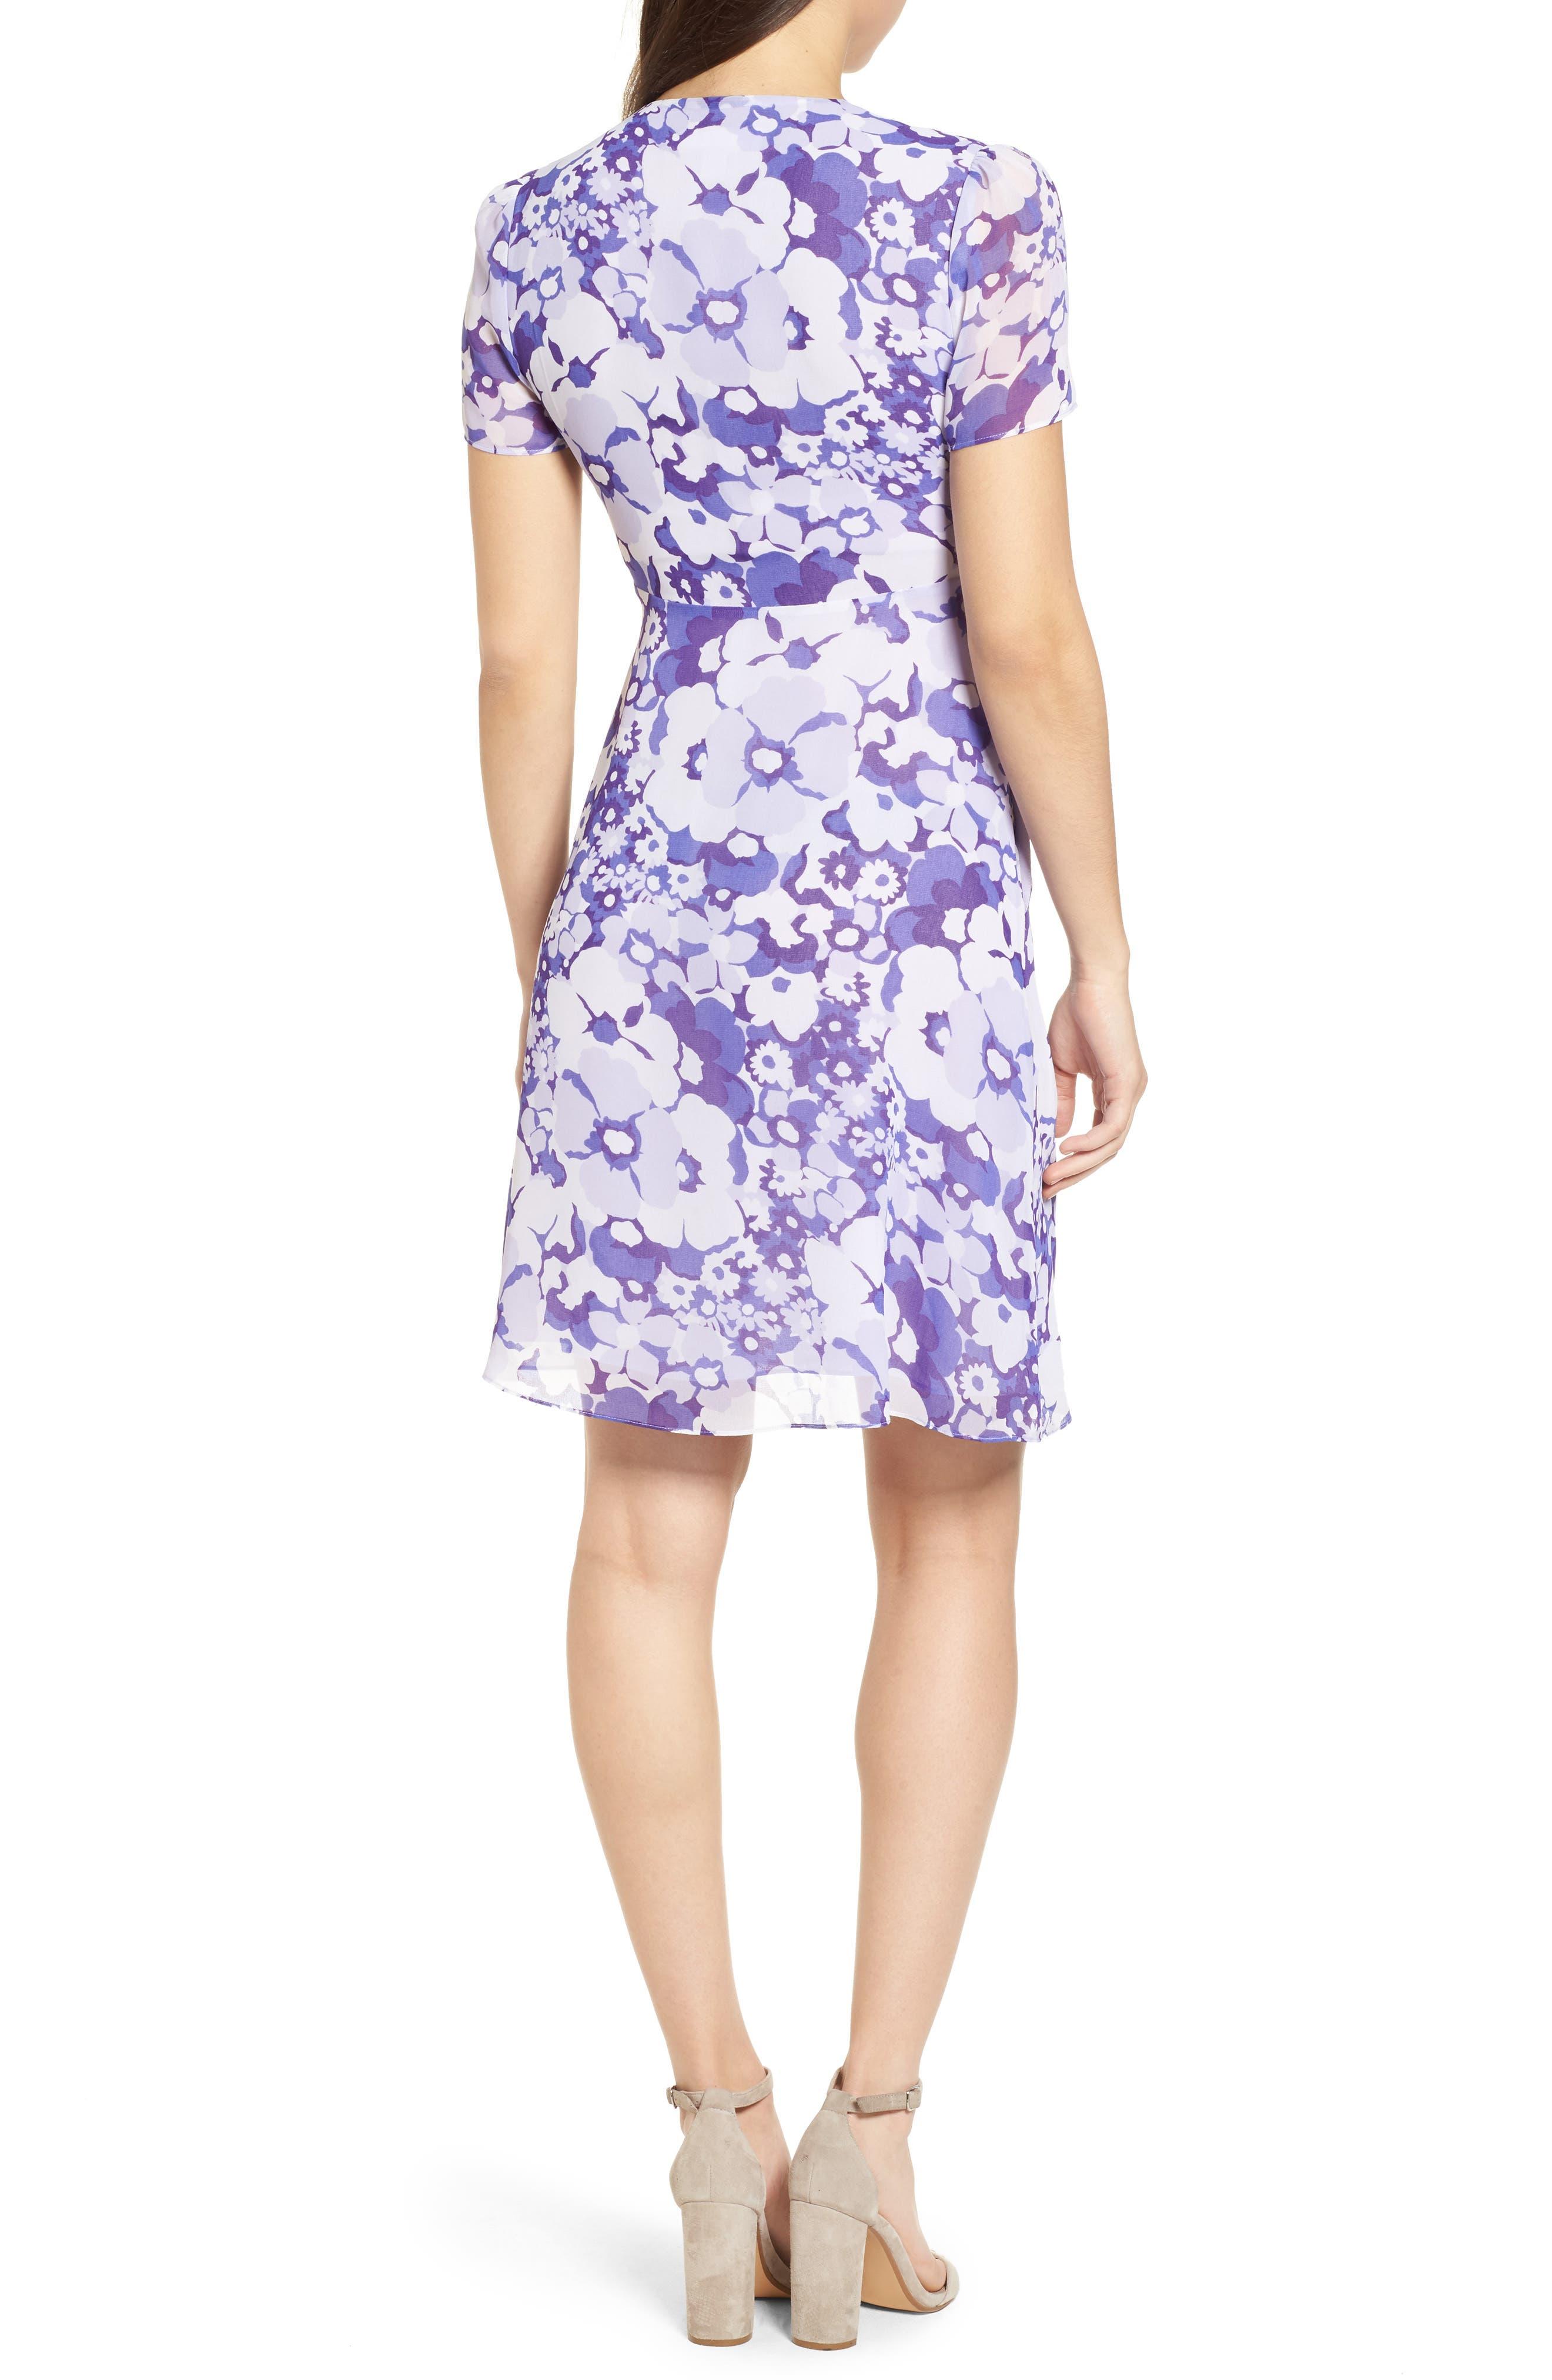 Springtime Floral Dress,                             Alternate thumbnail 2, color,                             580